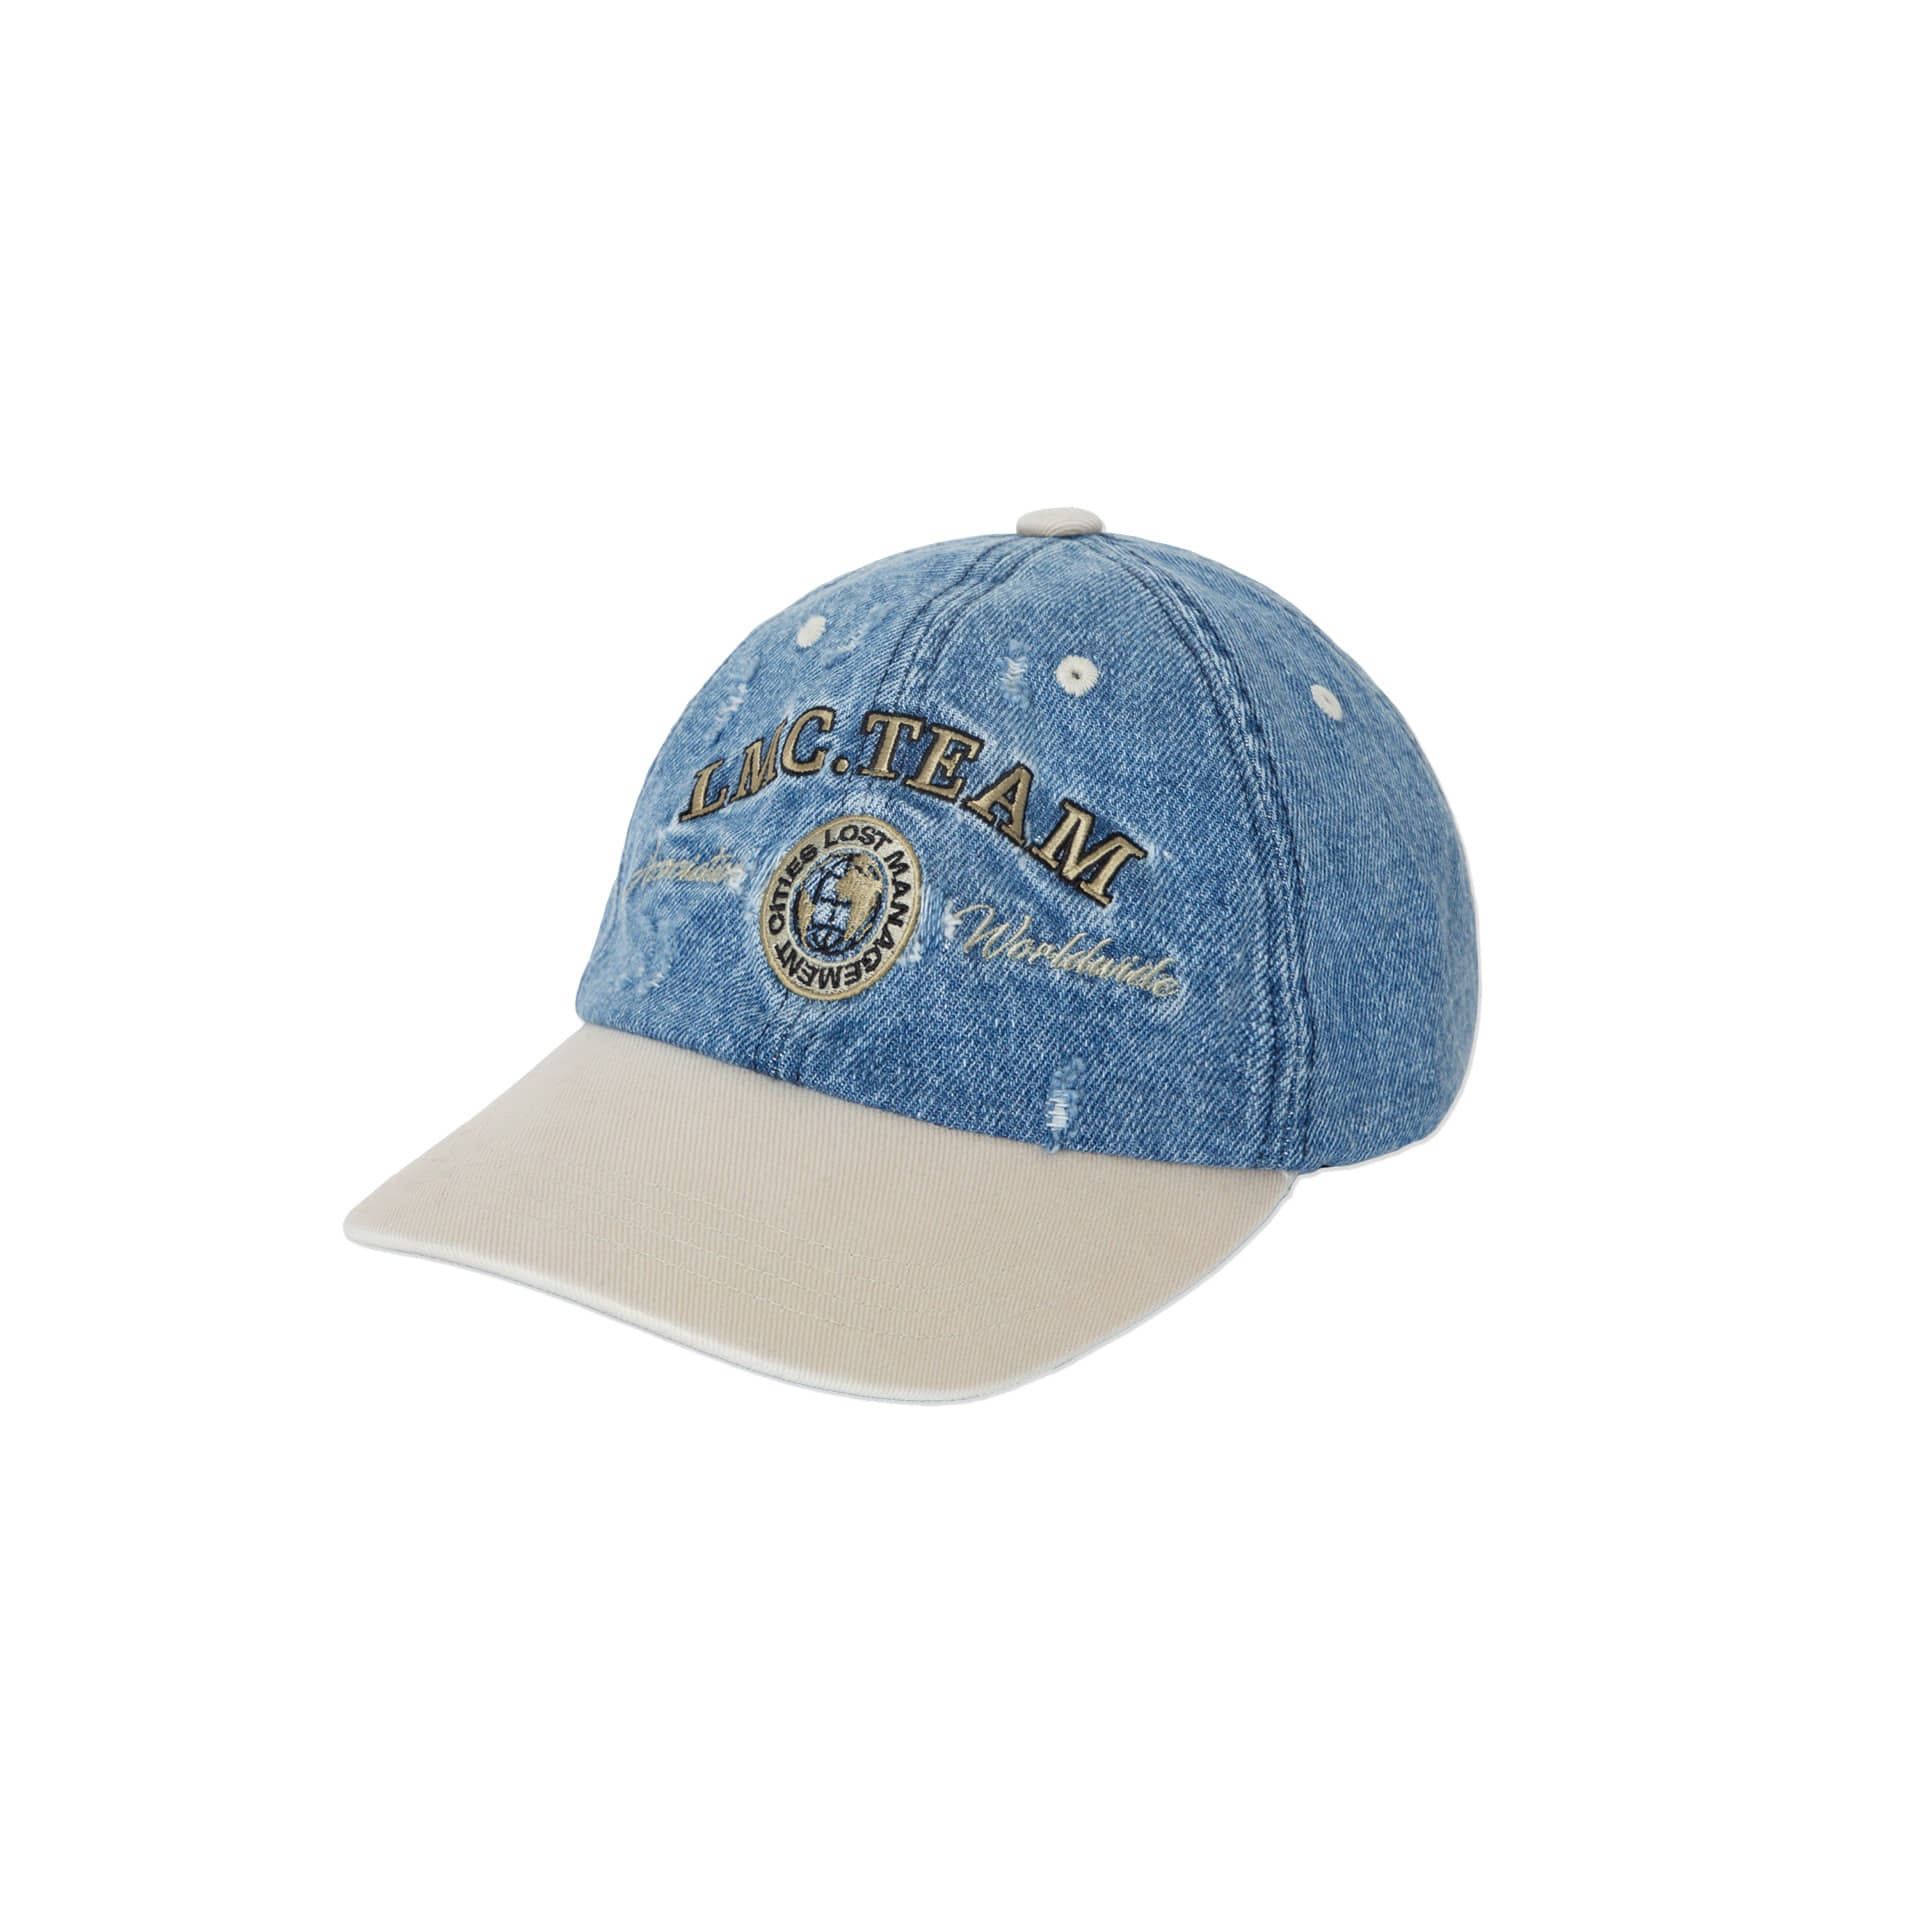 layer-LMC TWO TONE WASHED DENIM 6 PANEL CAP blue♡韓國男裝飾品